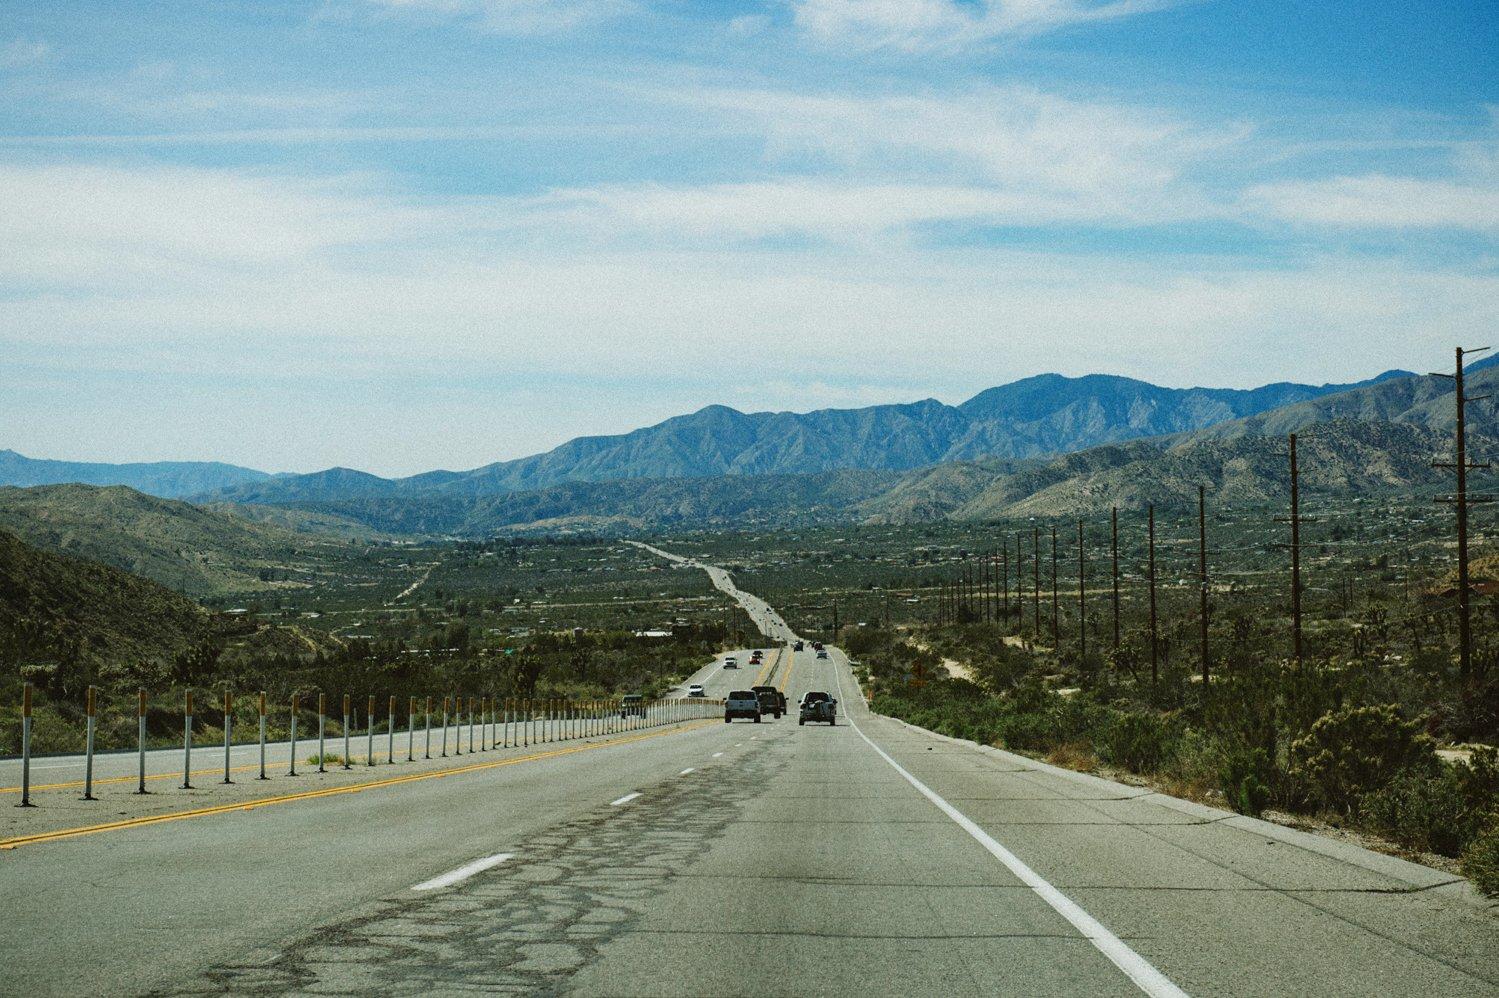 USA ROADTRIP TRAVEL PHOTOGRAPHY-235